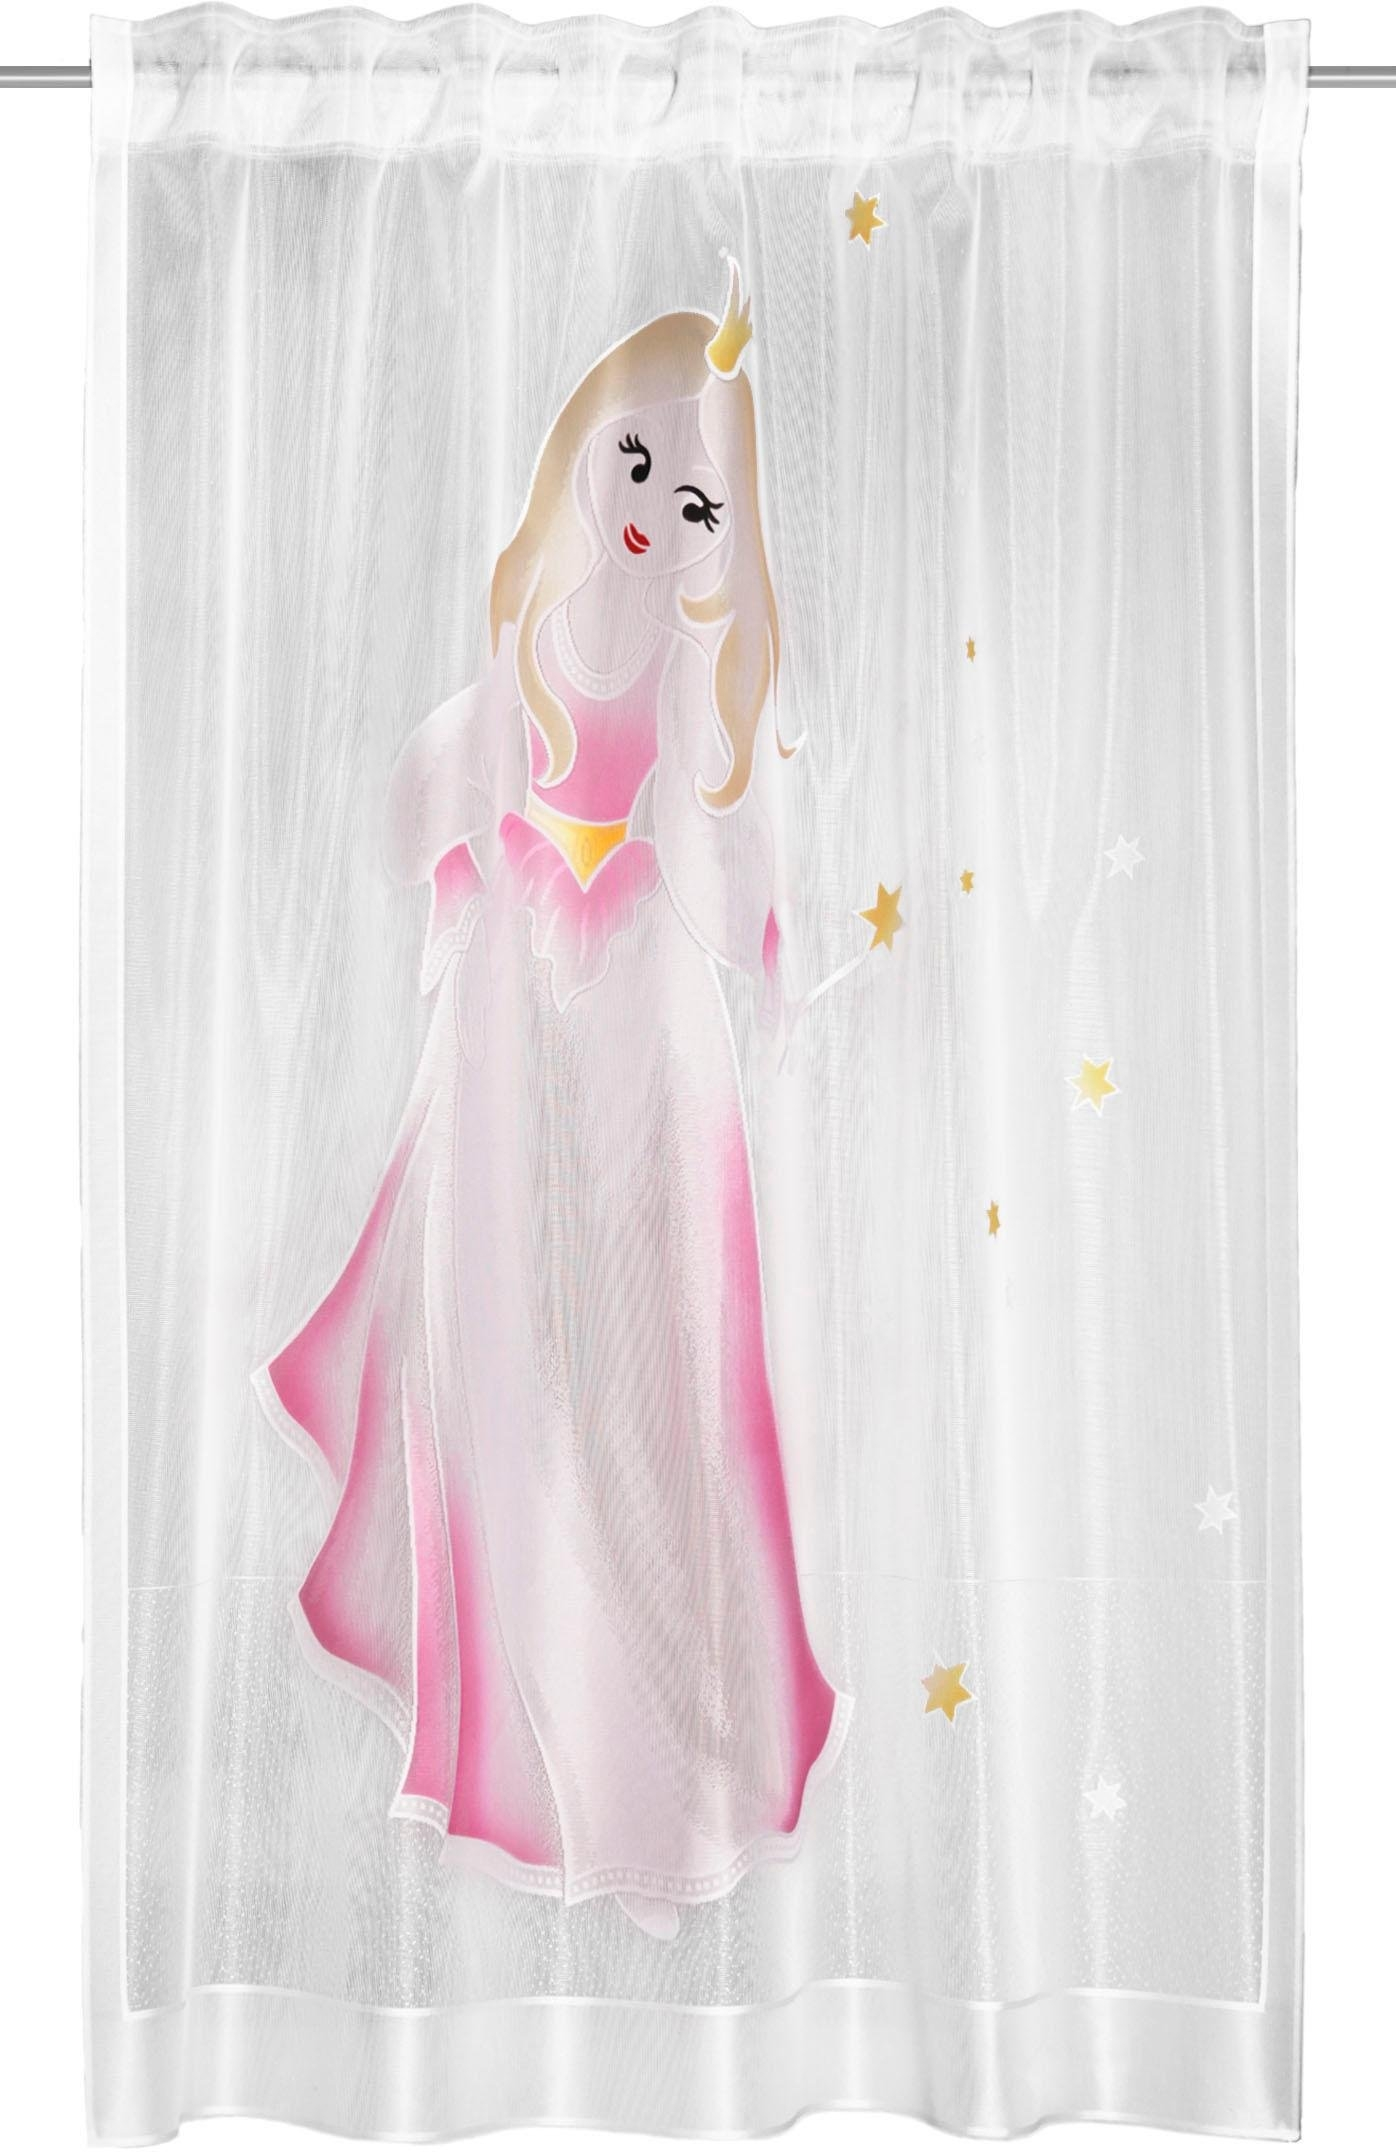 WILLKOMMEN ZUHAUSE by ALBANI GROUP gordijn »Barby« bij OTTO online kopen